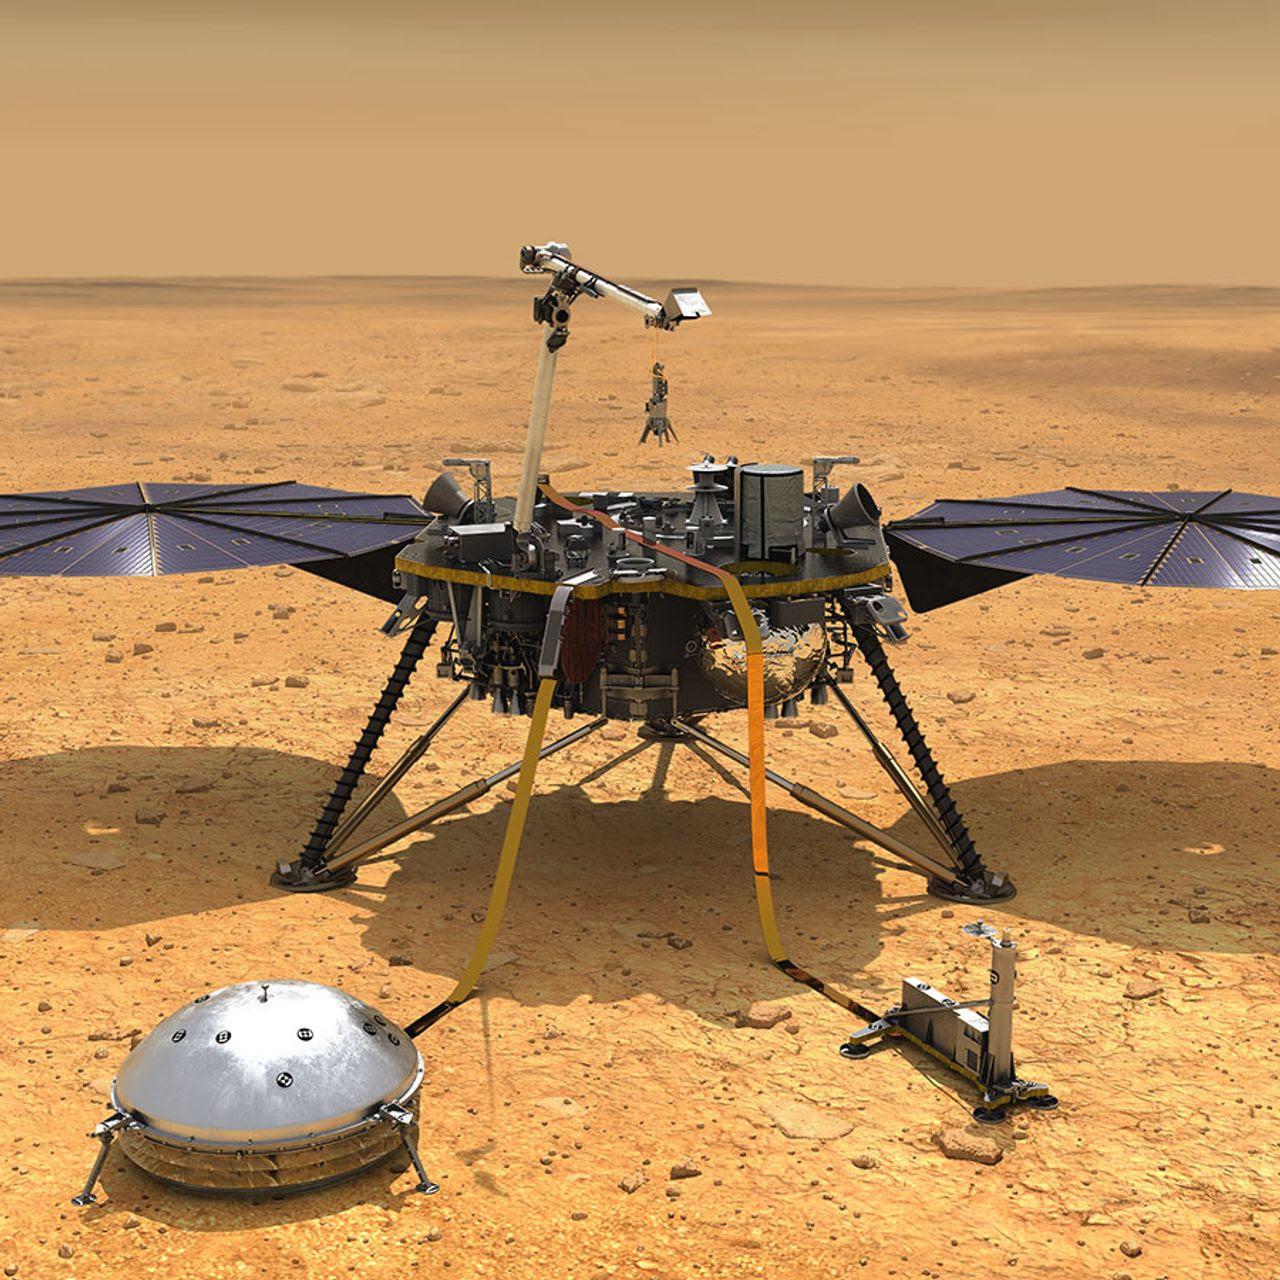 NASA's InSight Lander Gives First Look at Mars Interior, Yielding a Big Surprise